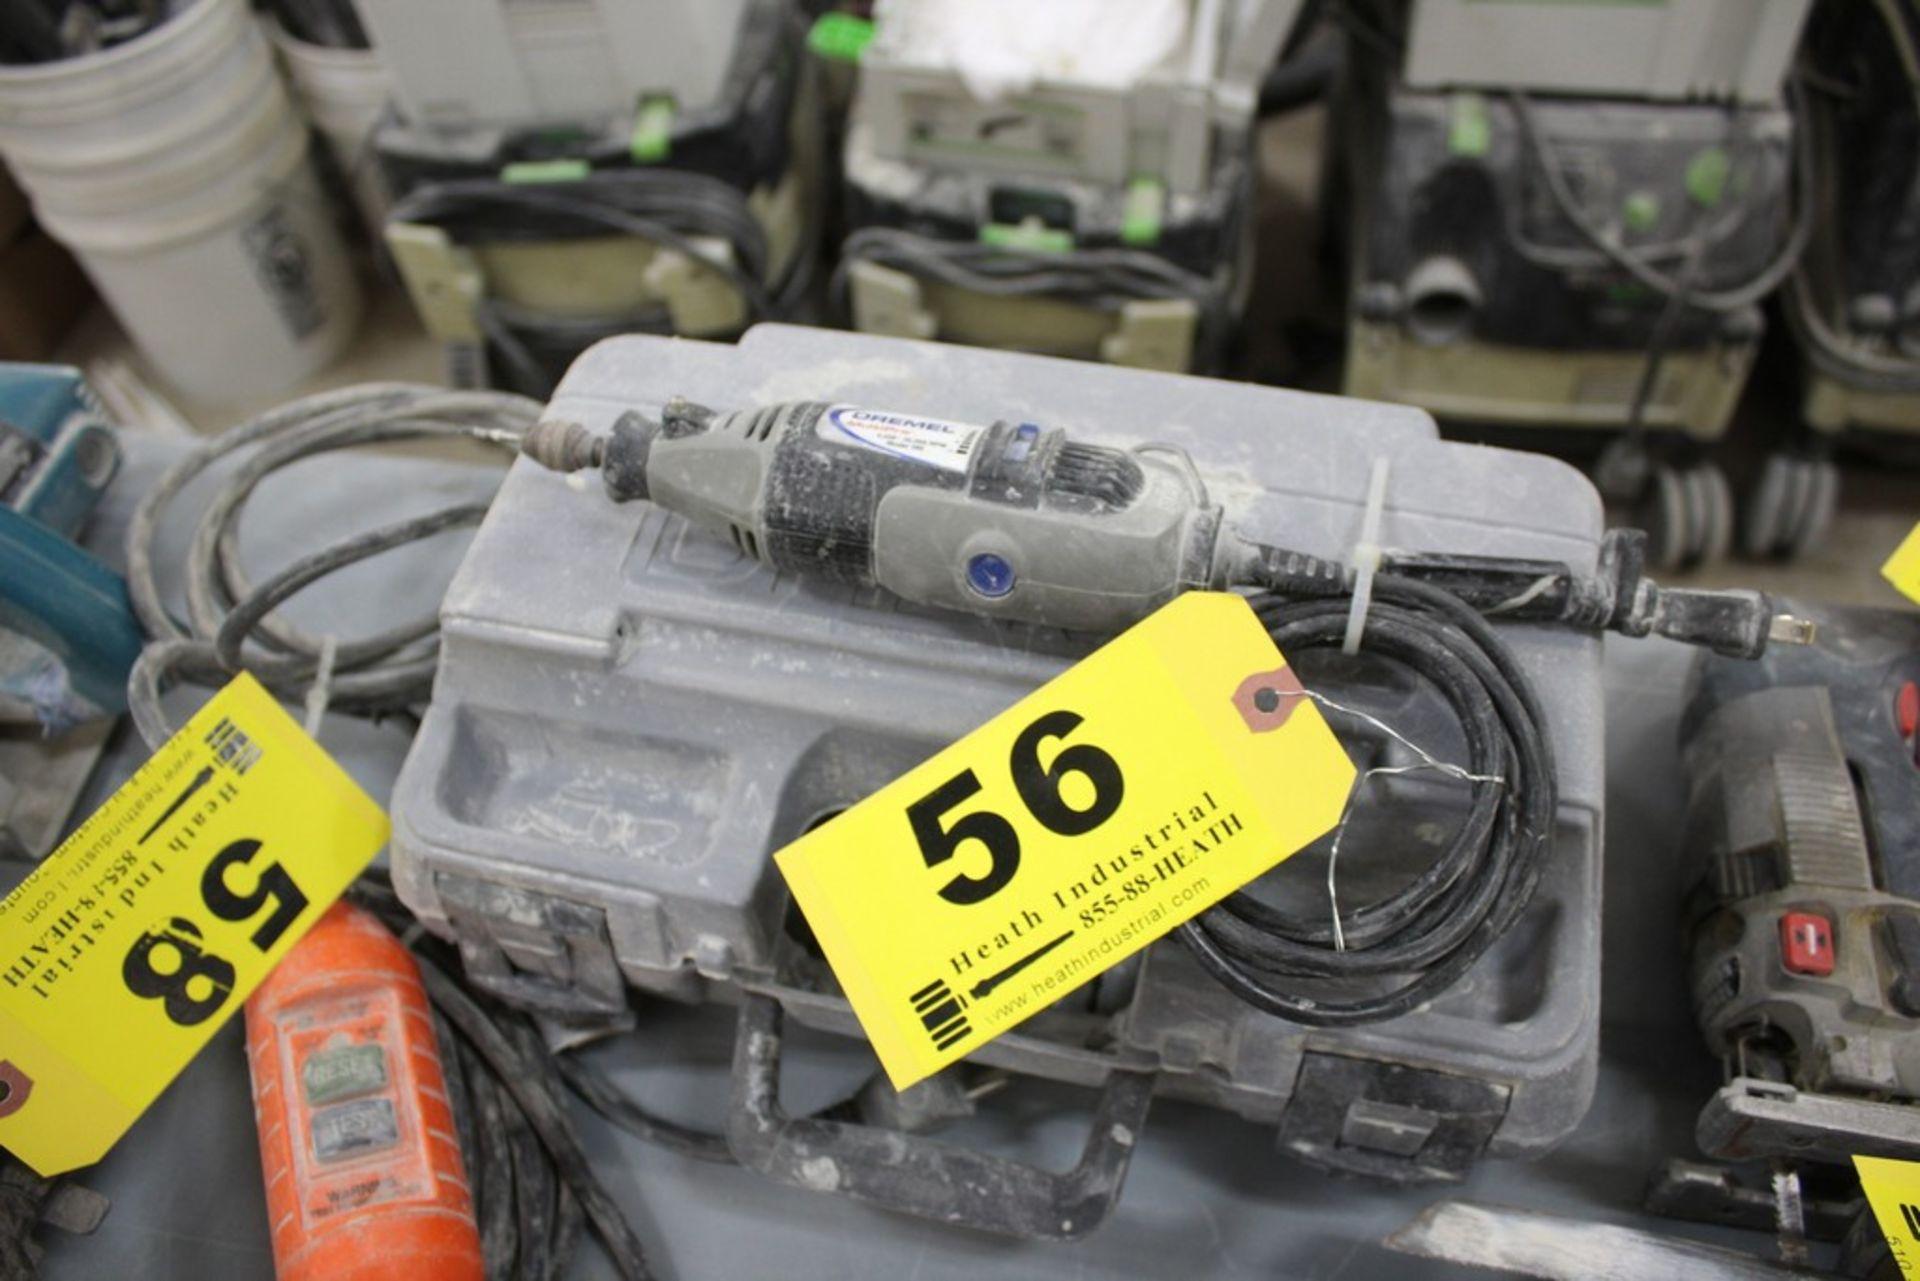 Lot 56 - DREMEL MULTI PRO MODEL 395 WITH CASE